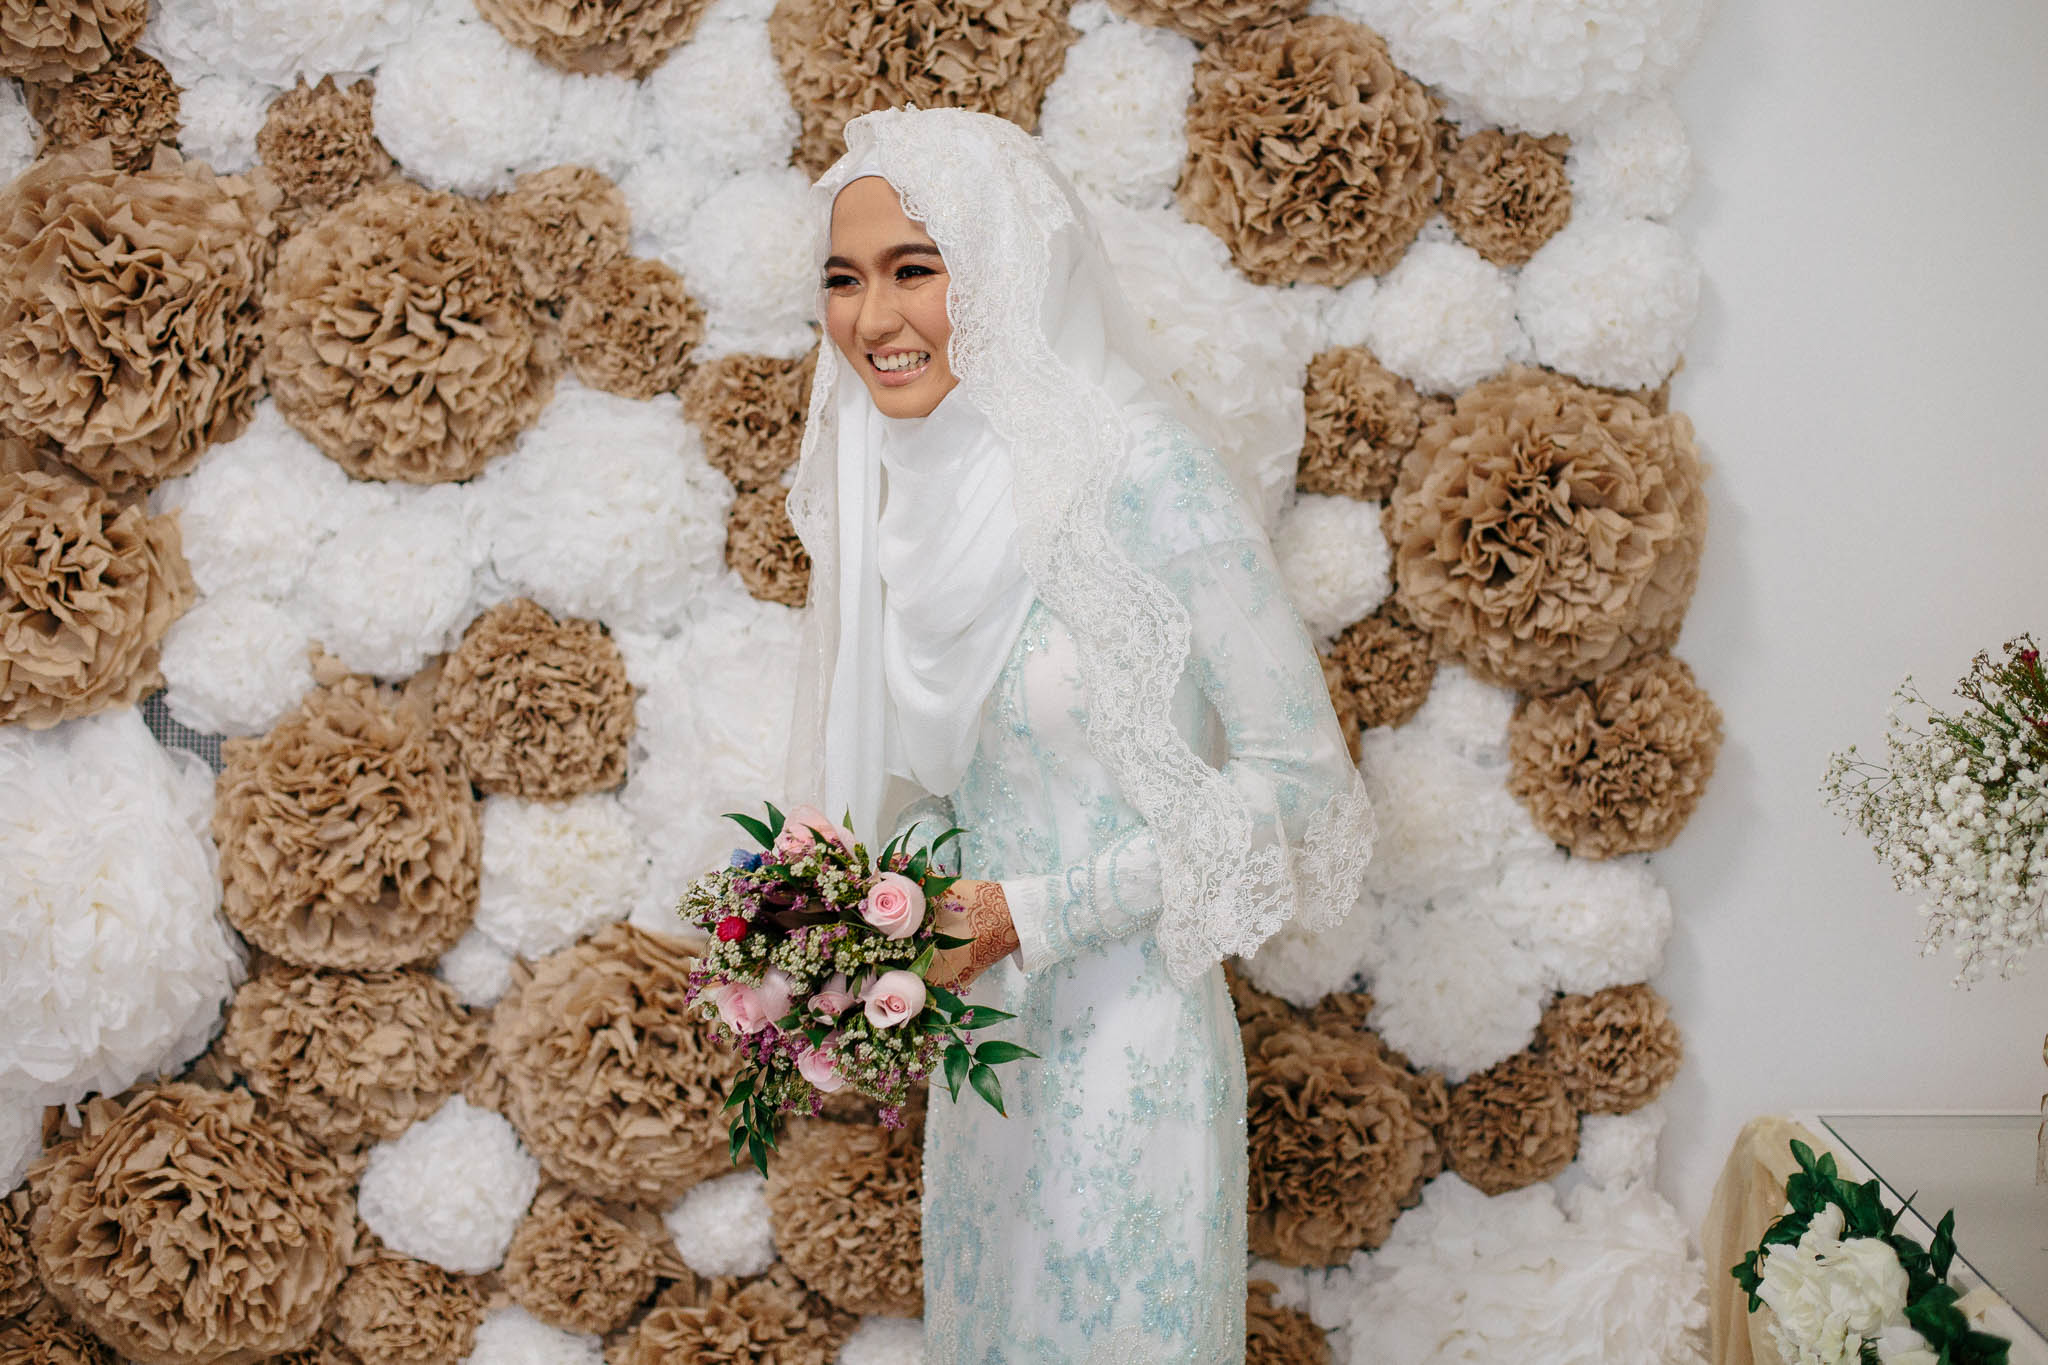 singapore-wedding-photographer-sharalyn-syazwan-007.jpg